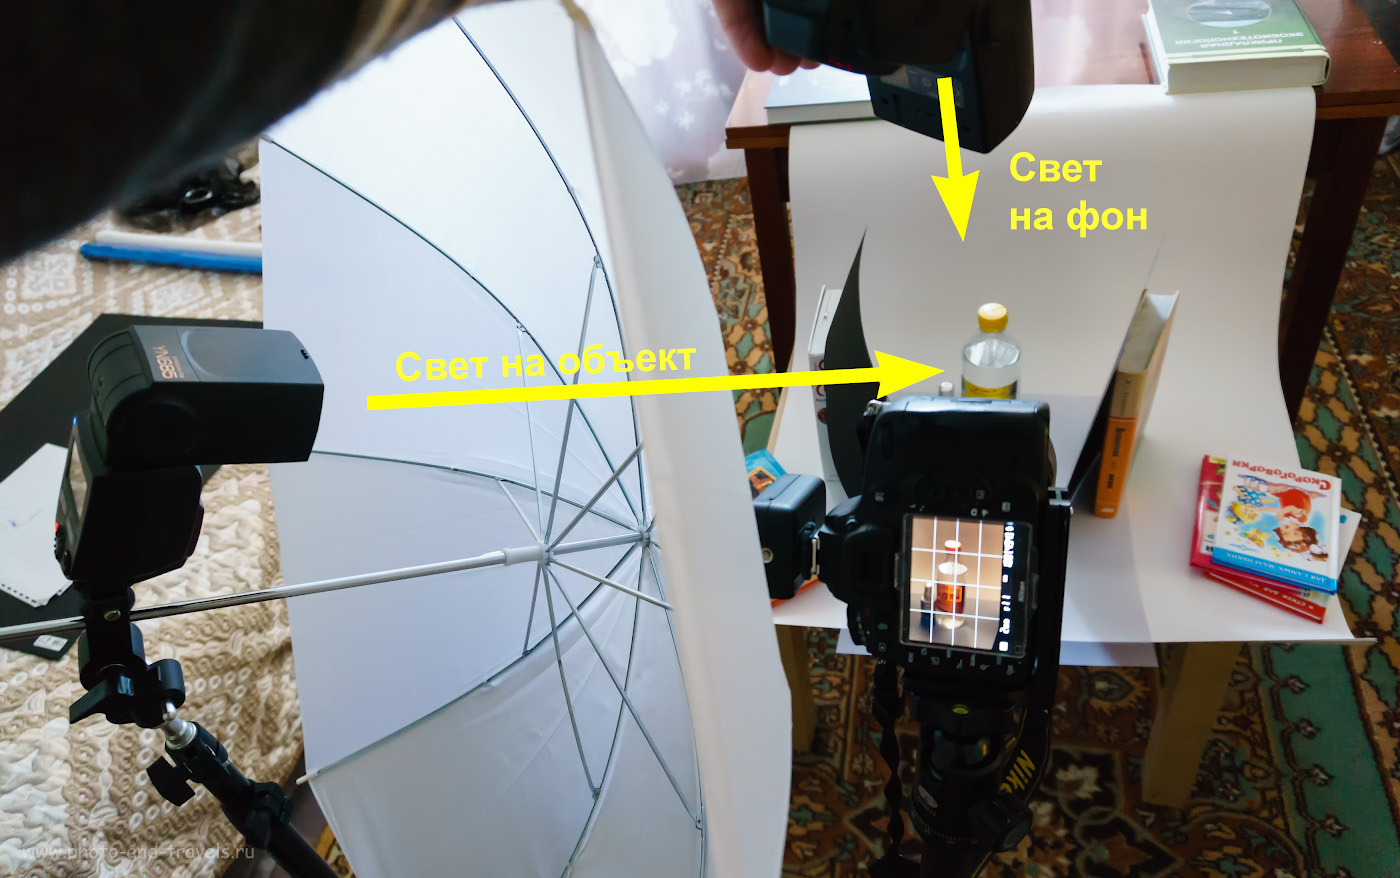 Фото 5. Как я ставил свет для съемки стеклянной бутылки с бензином «Галоша» для размачивания резинок объектива Nikon. Снято на беззеркалку Sony A6000 KIT 16-50mm f/3.5-5.6. Настройки: 1/60, +2.0 EV, 3200, 16.